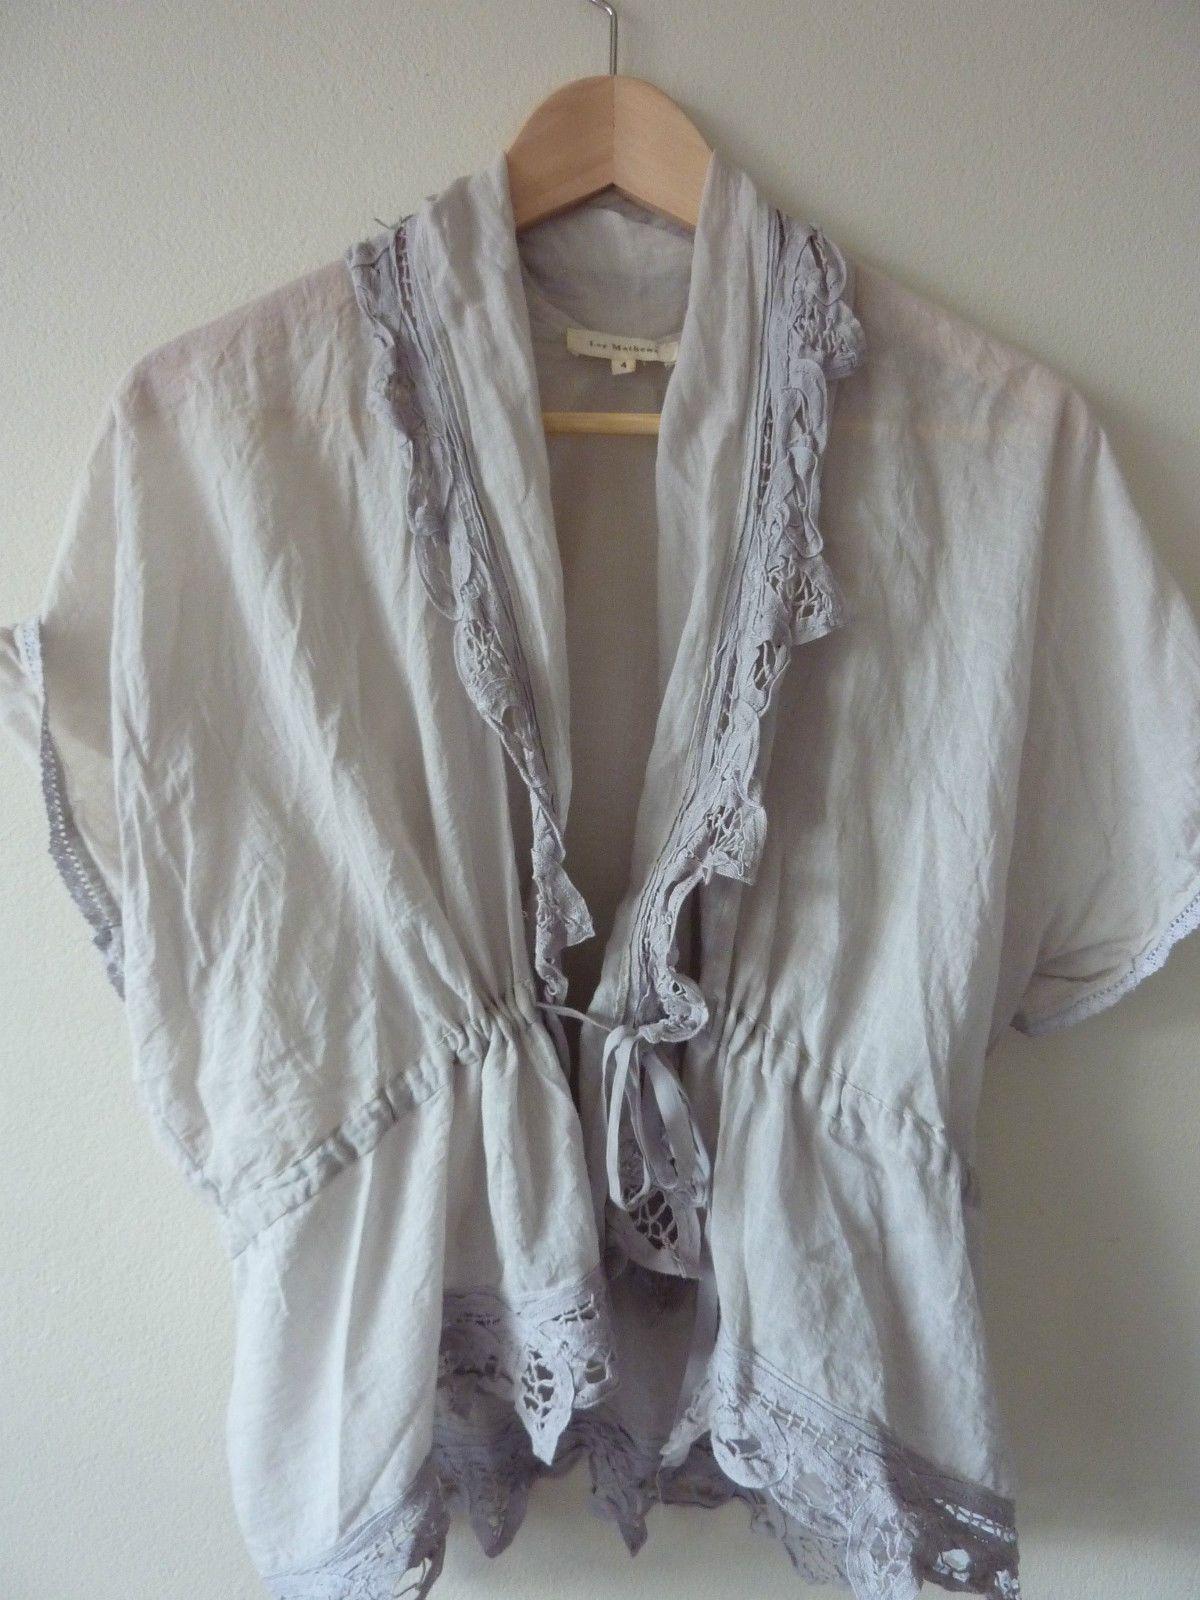 LEE Mathews Luxury Soft Cotton Cardigan